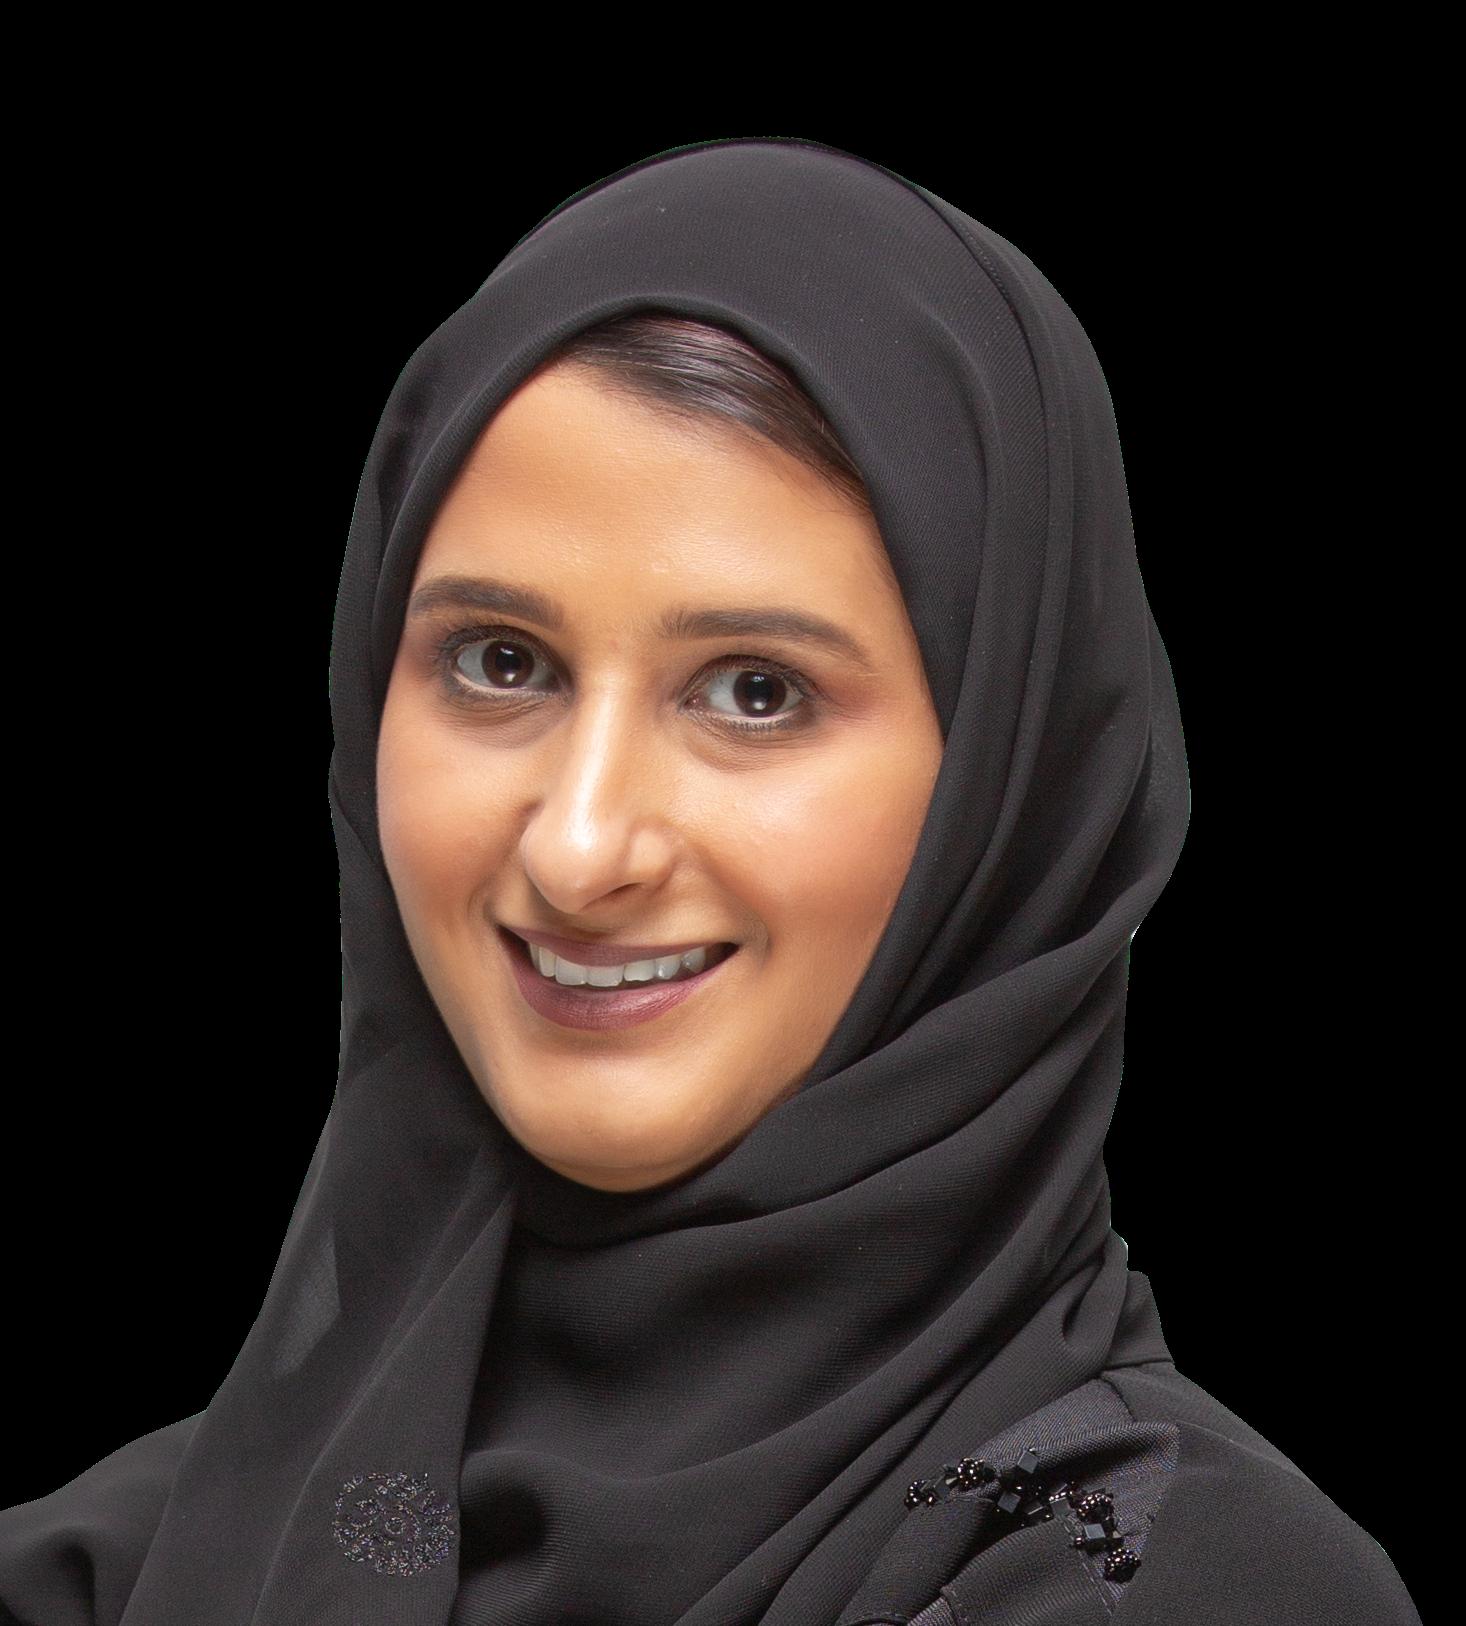 https://mbrif.ae/wp-content/uploads/2020/01/Laila-Al-Saadi-1.png